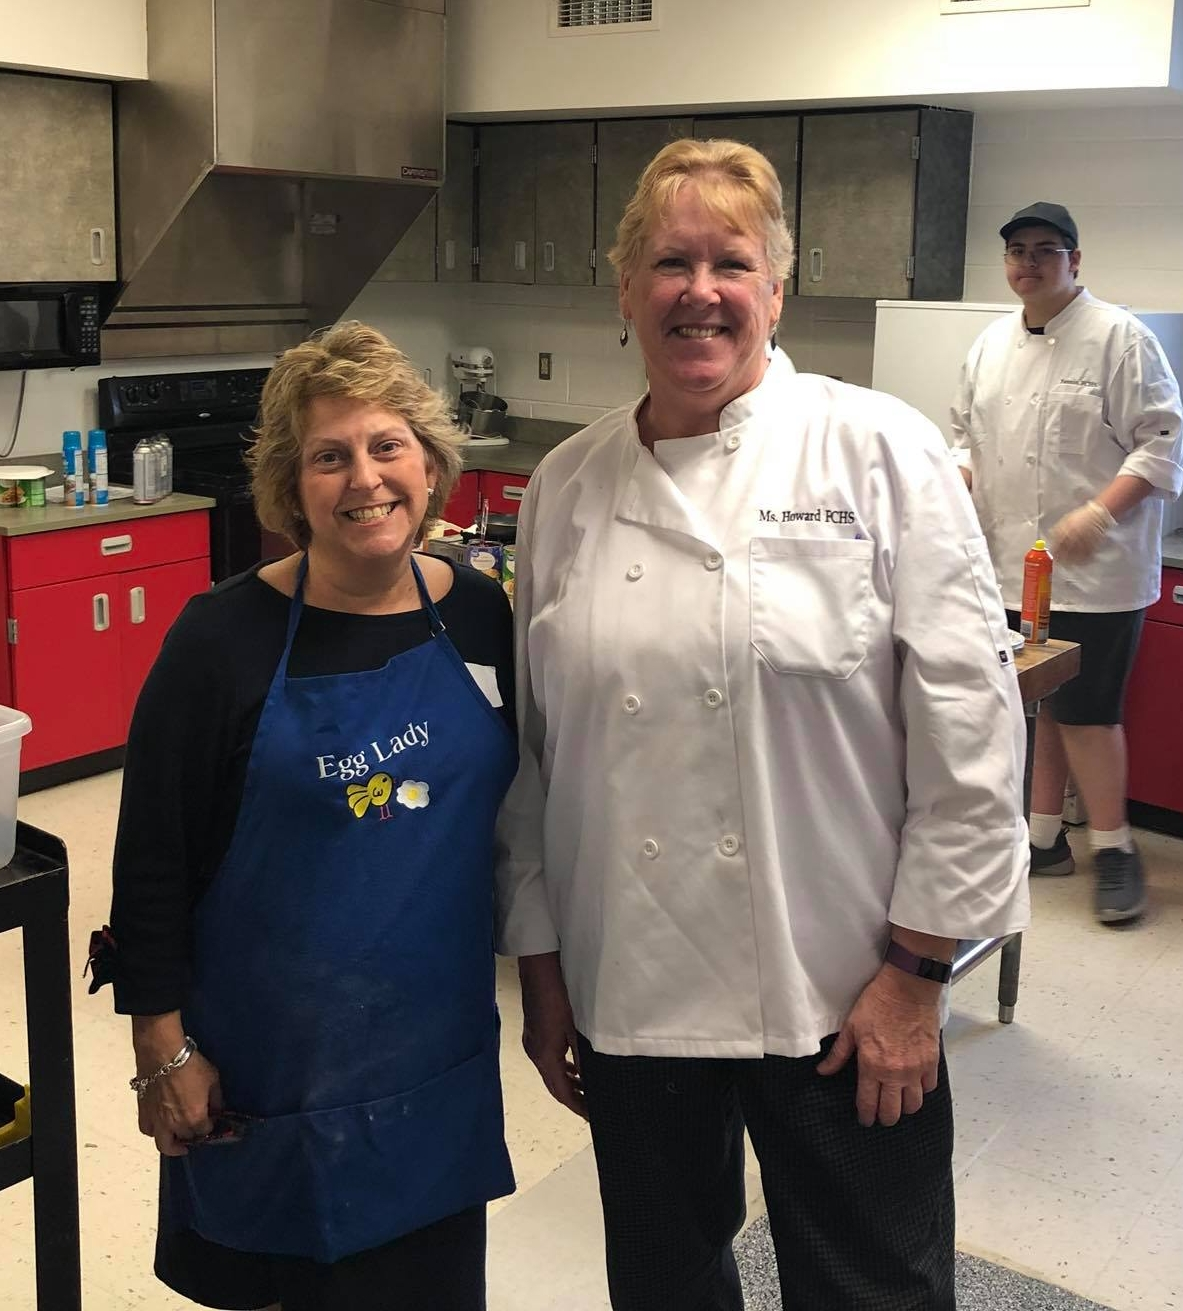 Cassinda with Fleming County High School culinary arts teacher Debbie Howard.